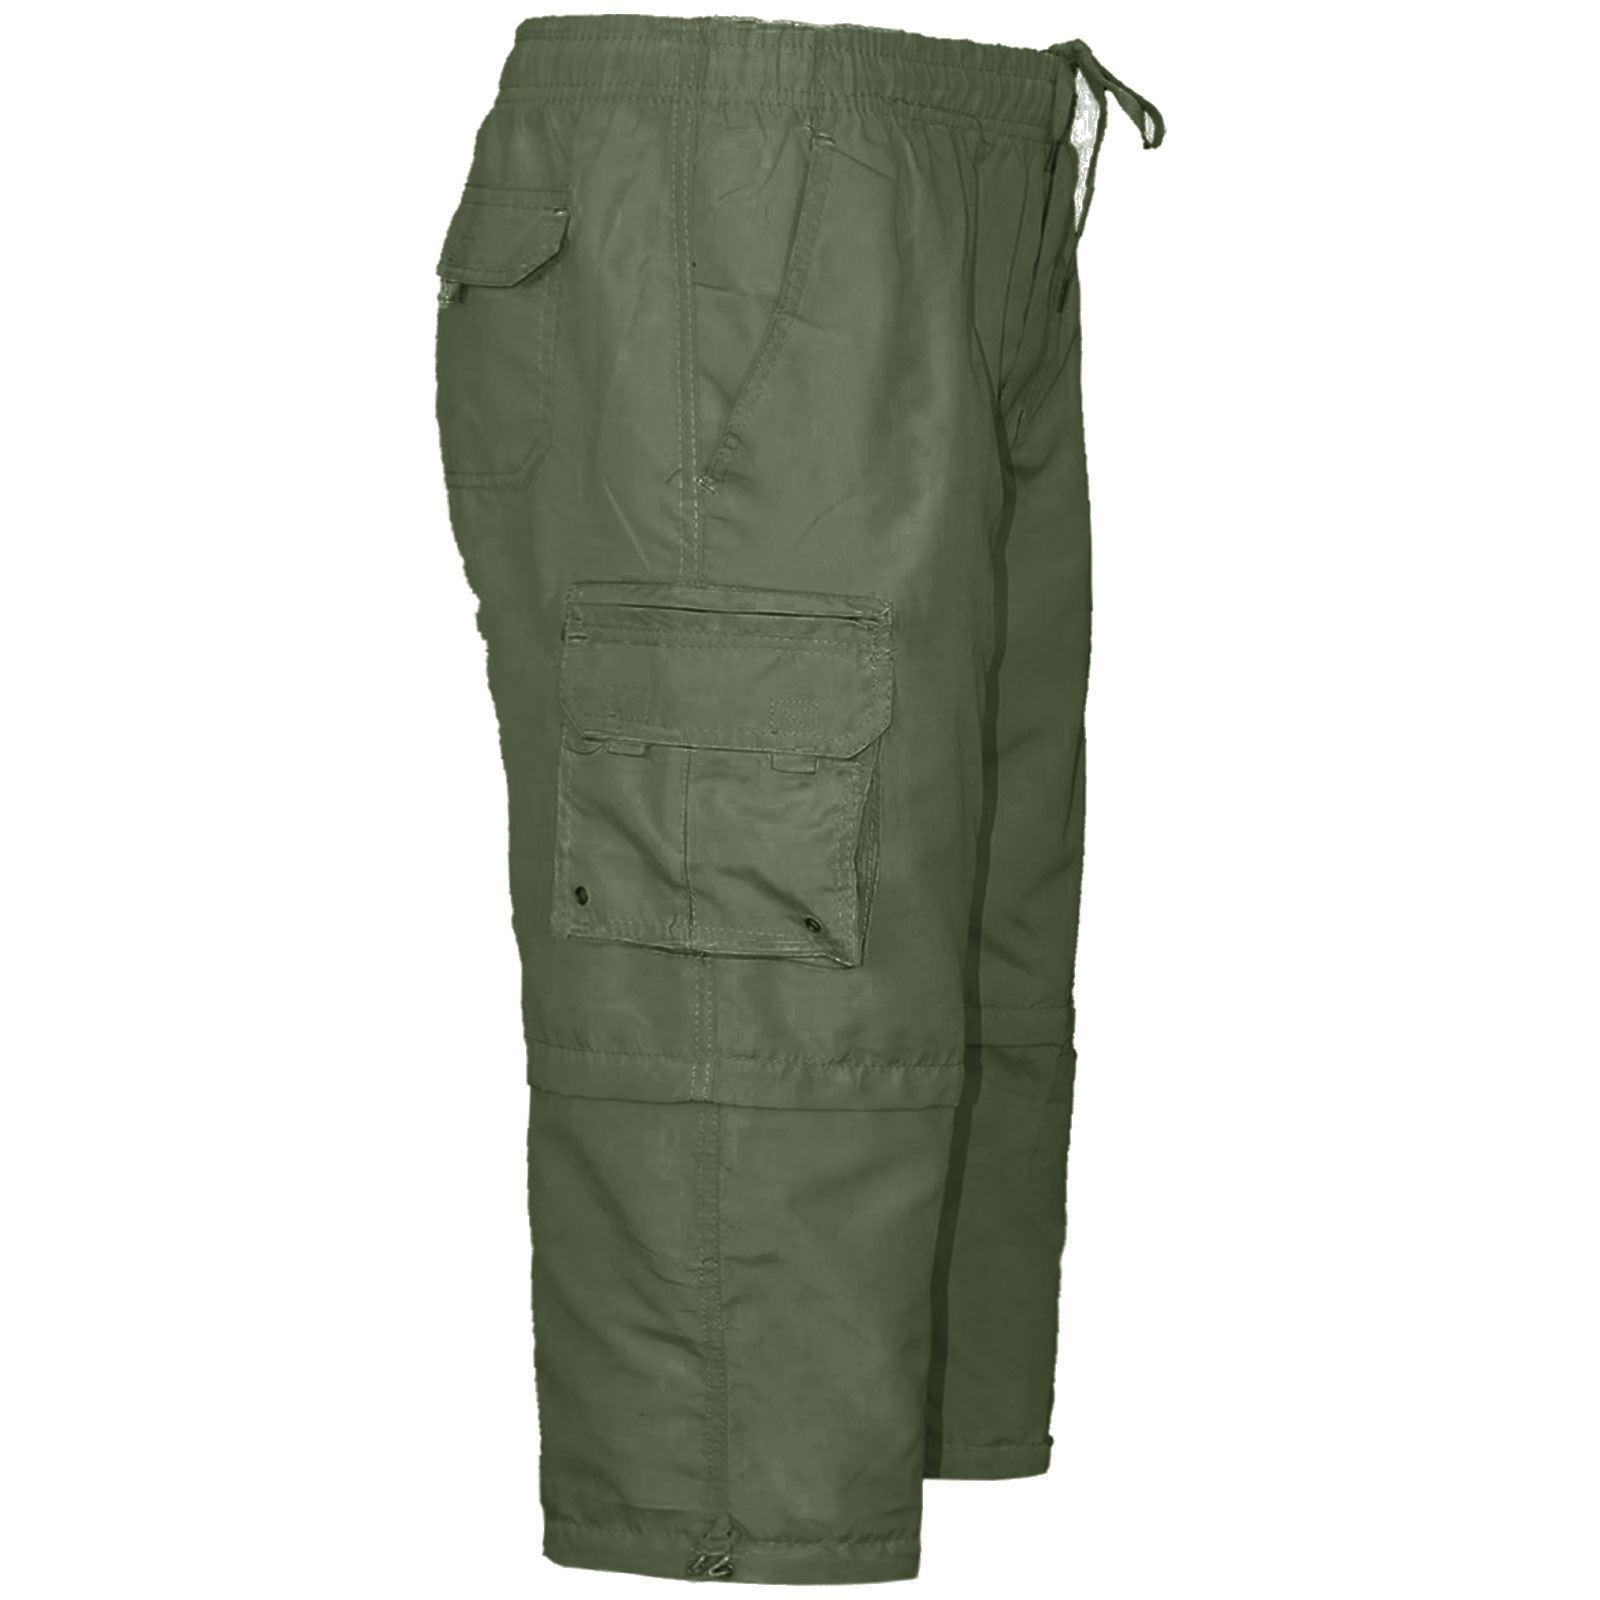 Mens 2 in 1 Plain Gym Elasticated Jogging Shorts 3//4 Running Cargo Zip Pockets